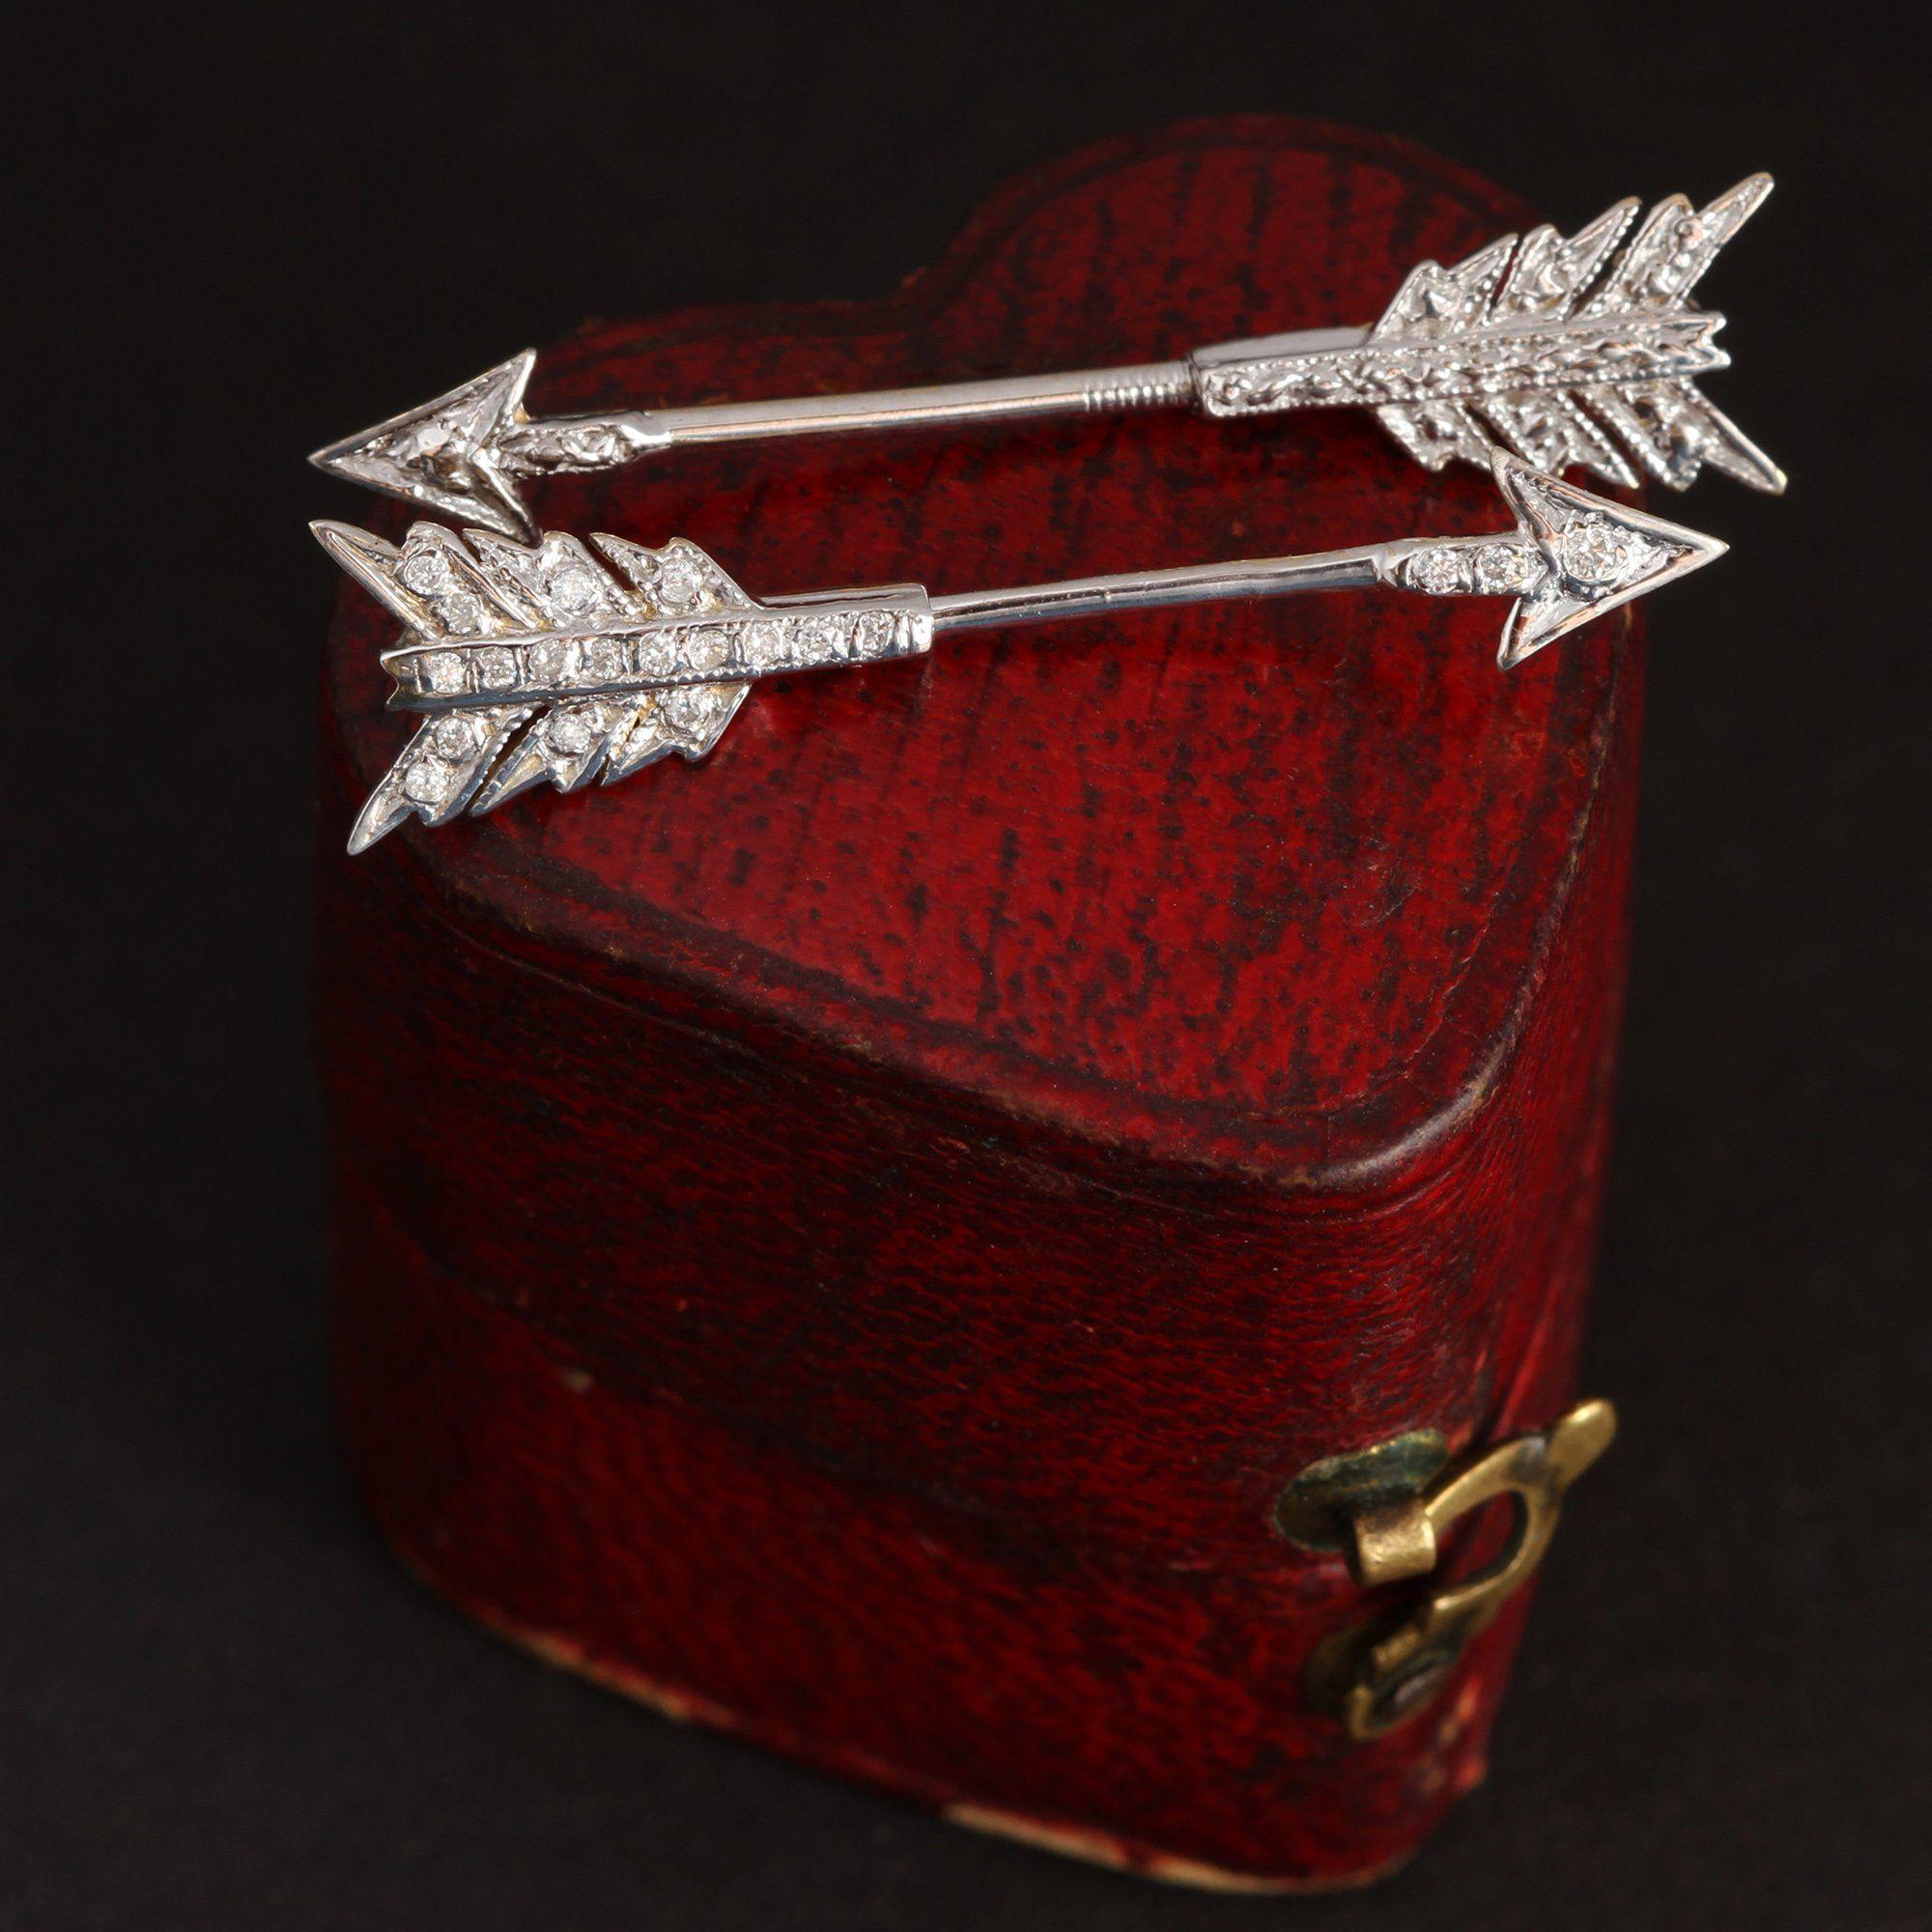 Archery Earring (14k Gold with Diamonds)